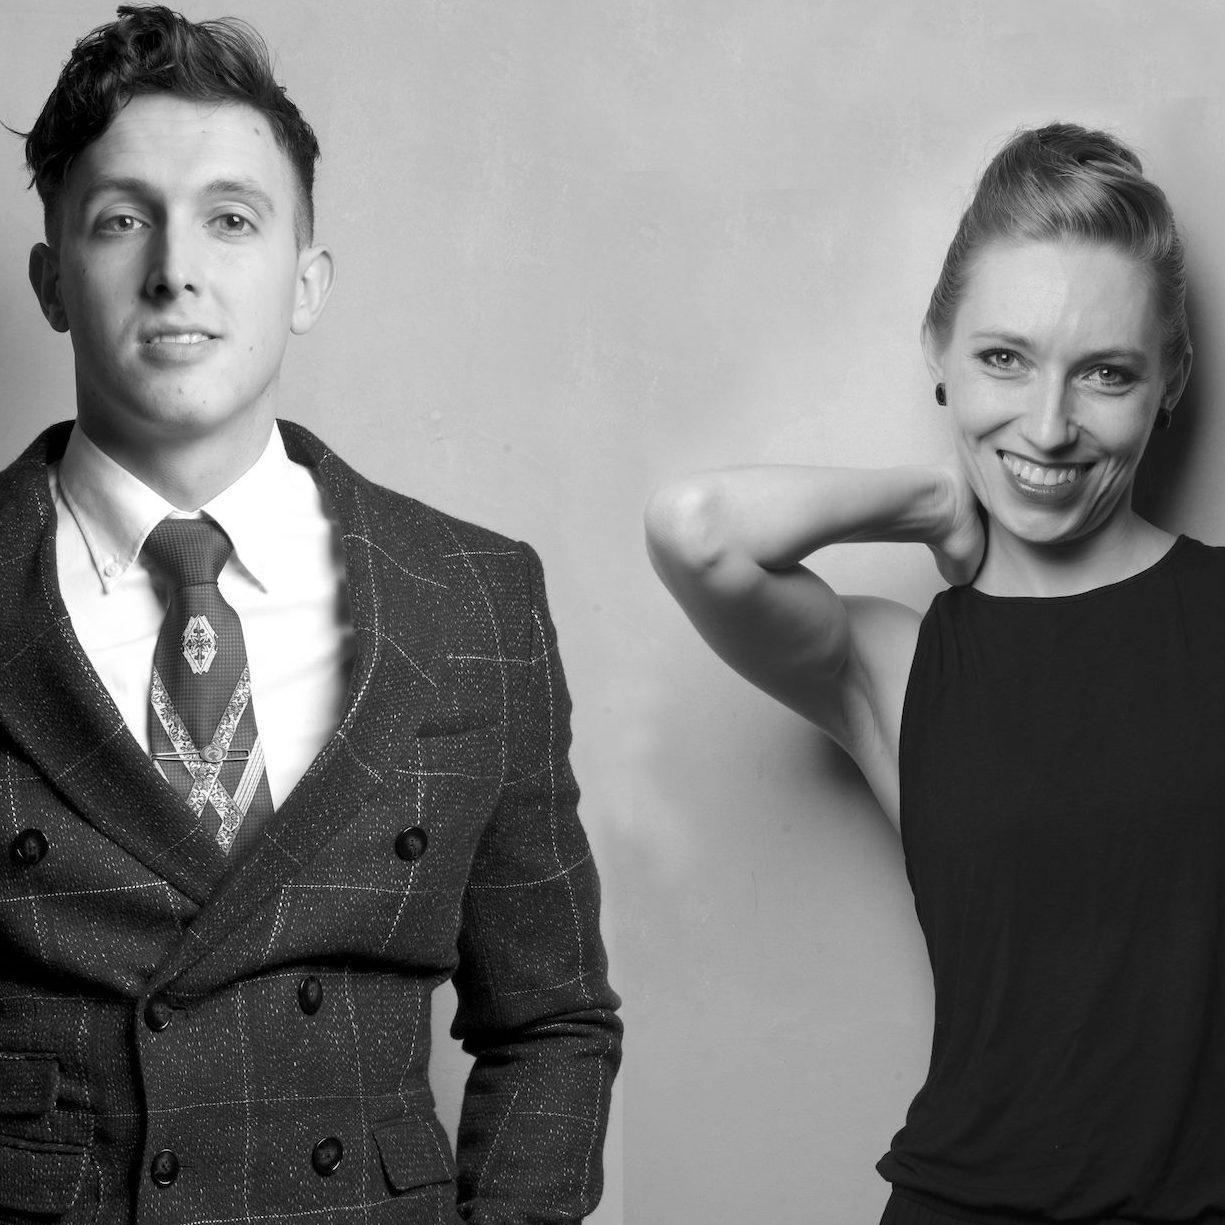 Hugo Marty & Mélanie Ohl